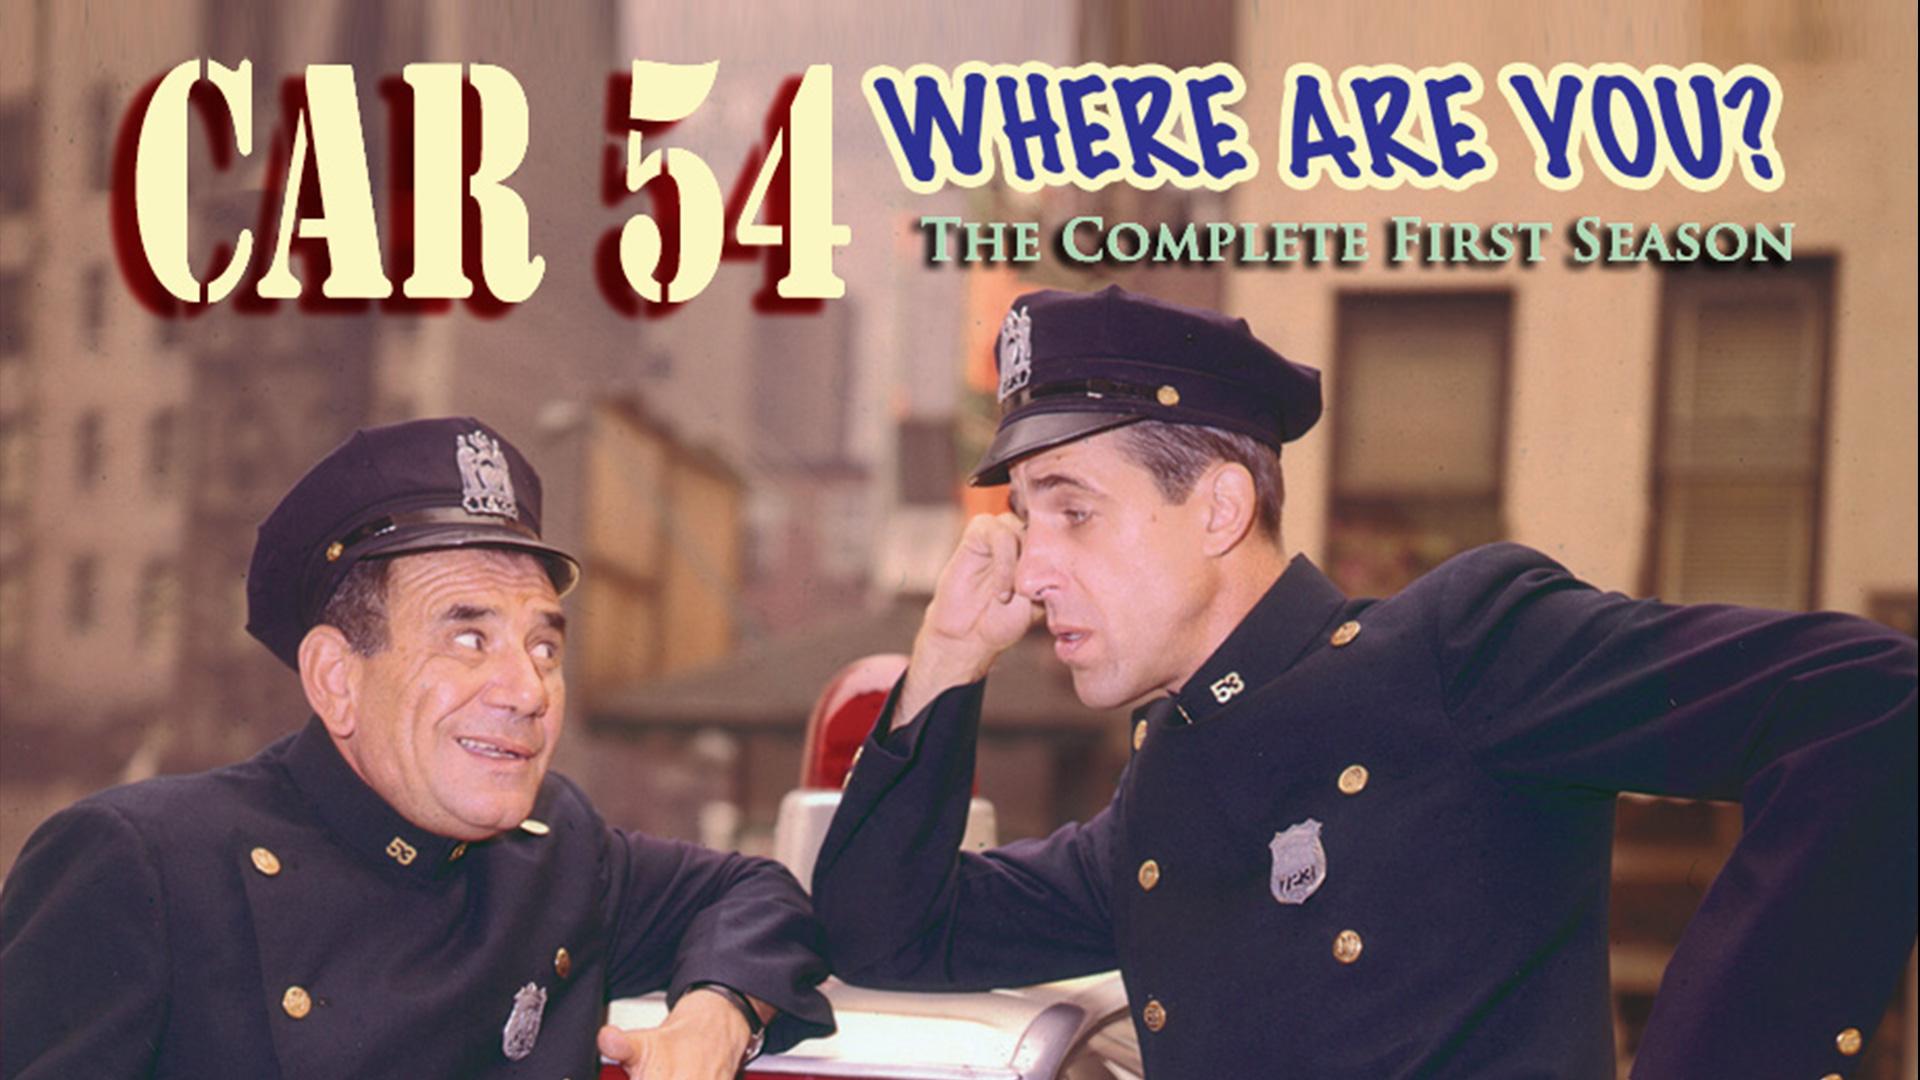 Car 54, Where Are You? Season 1